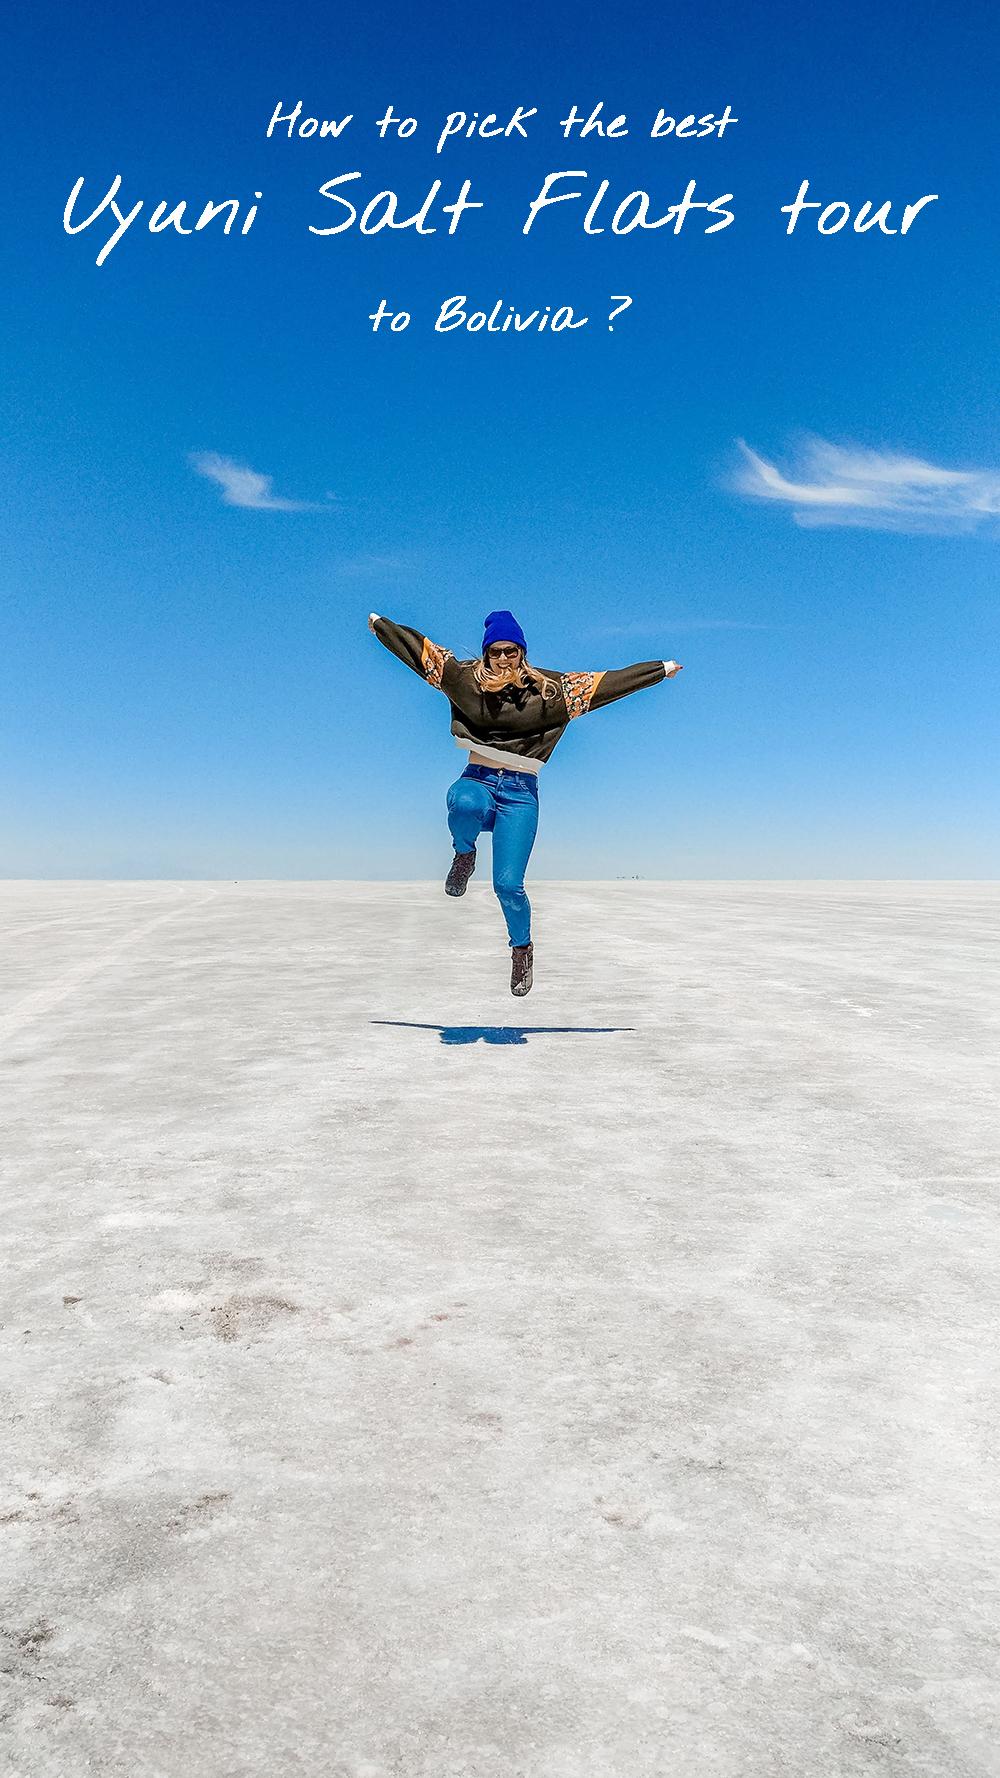 How to pick the best Uyuni Salt Flats tour to Bolivia? | Aliz's Wonderland